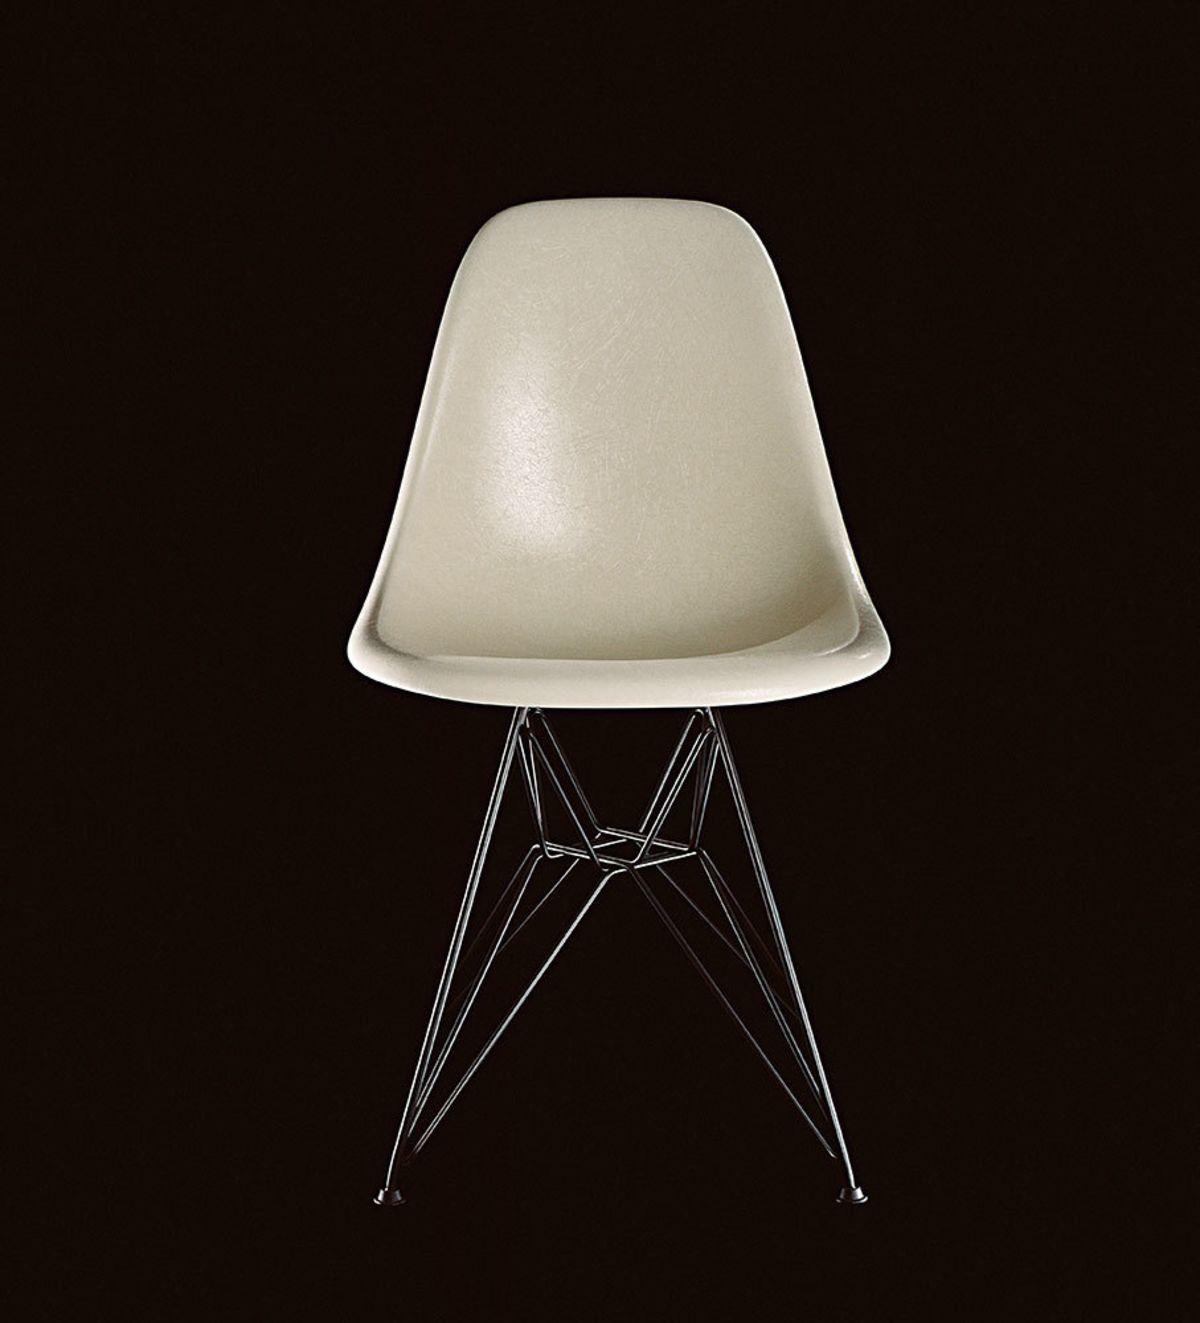 eames fiberglass chair bird knoll artek the from vitra is back parchment mailer